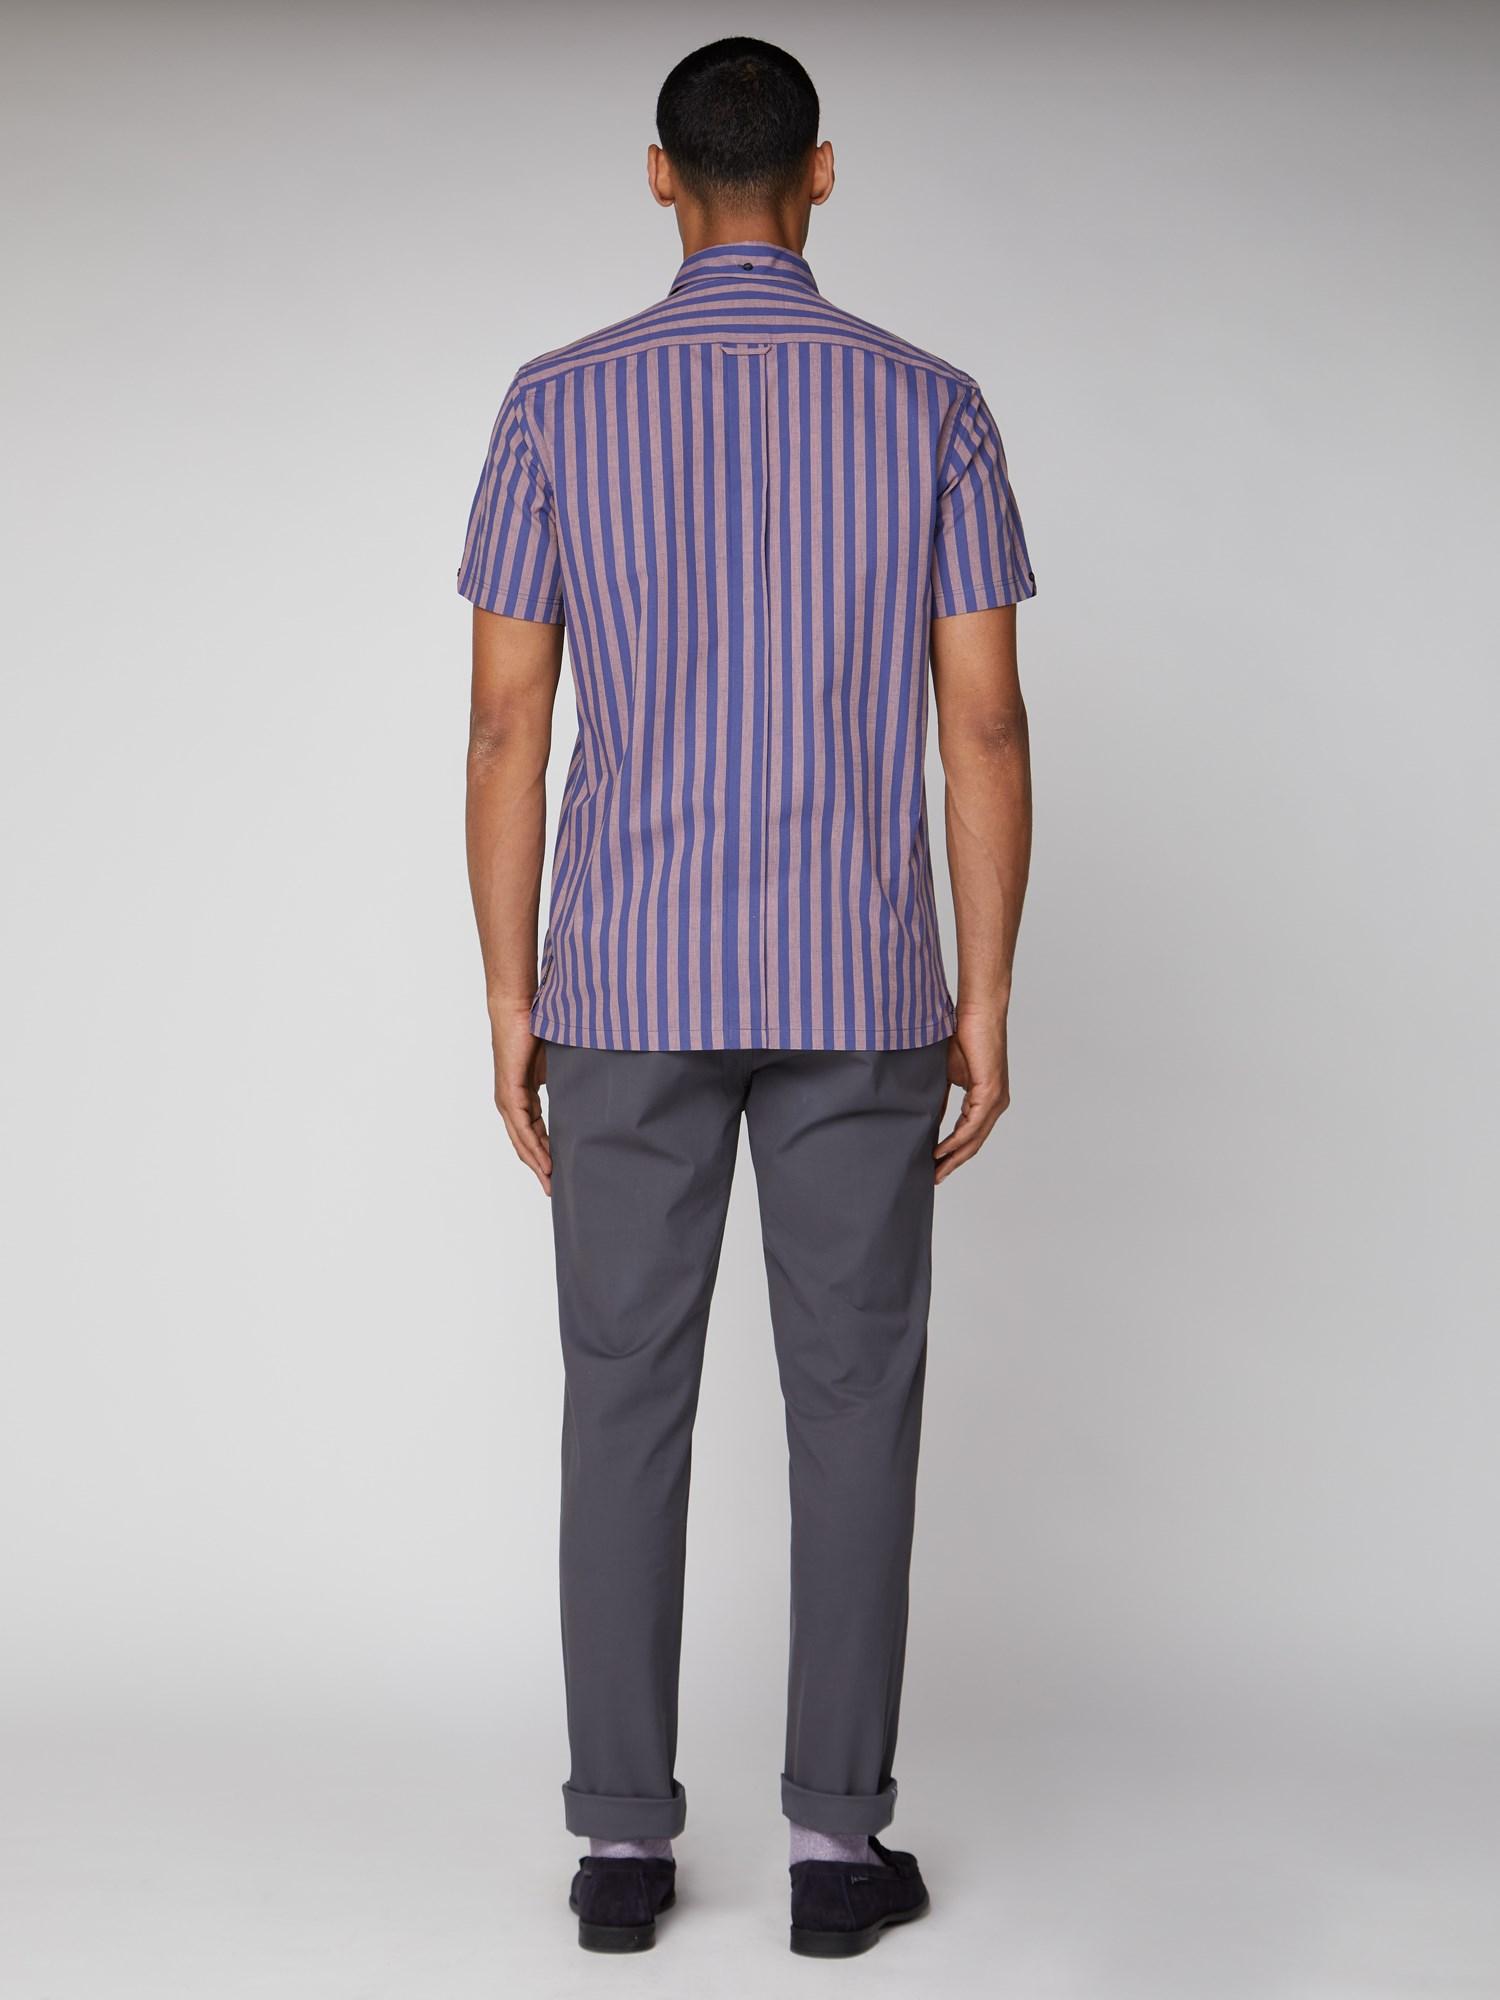 Short Sleeve Slub Stripe Shirt